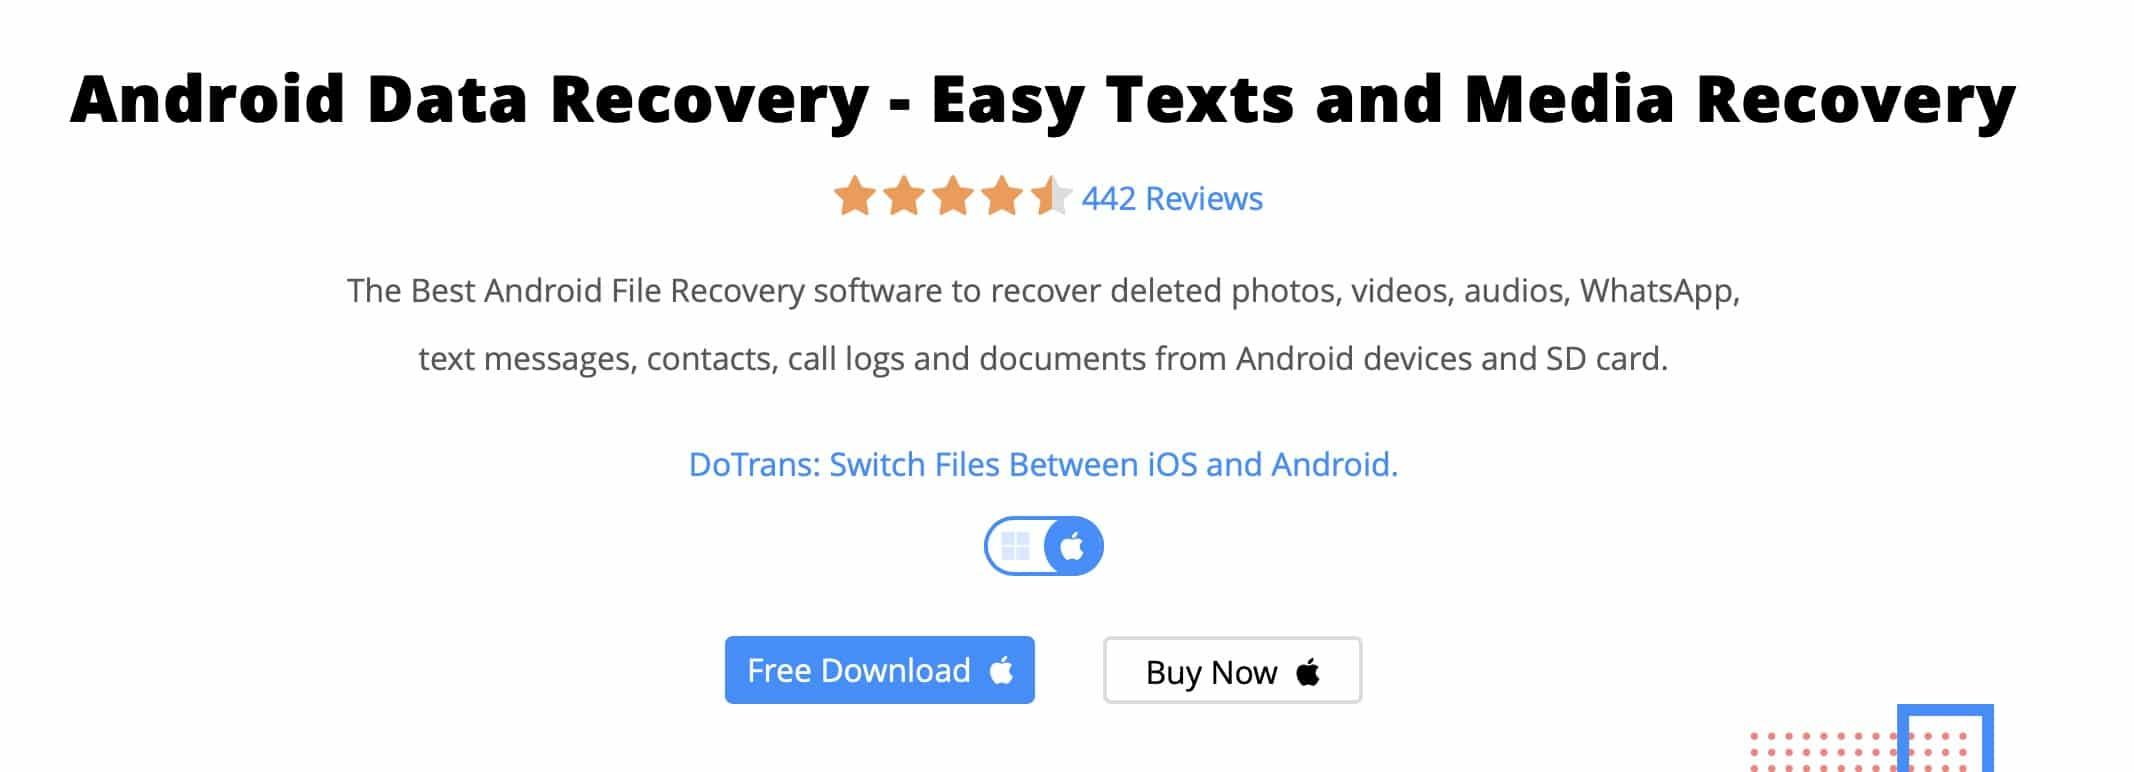 Como recuperar mensagens excluídas no Android